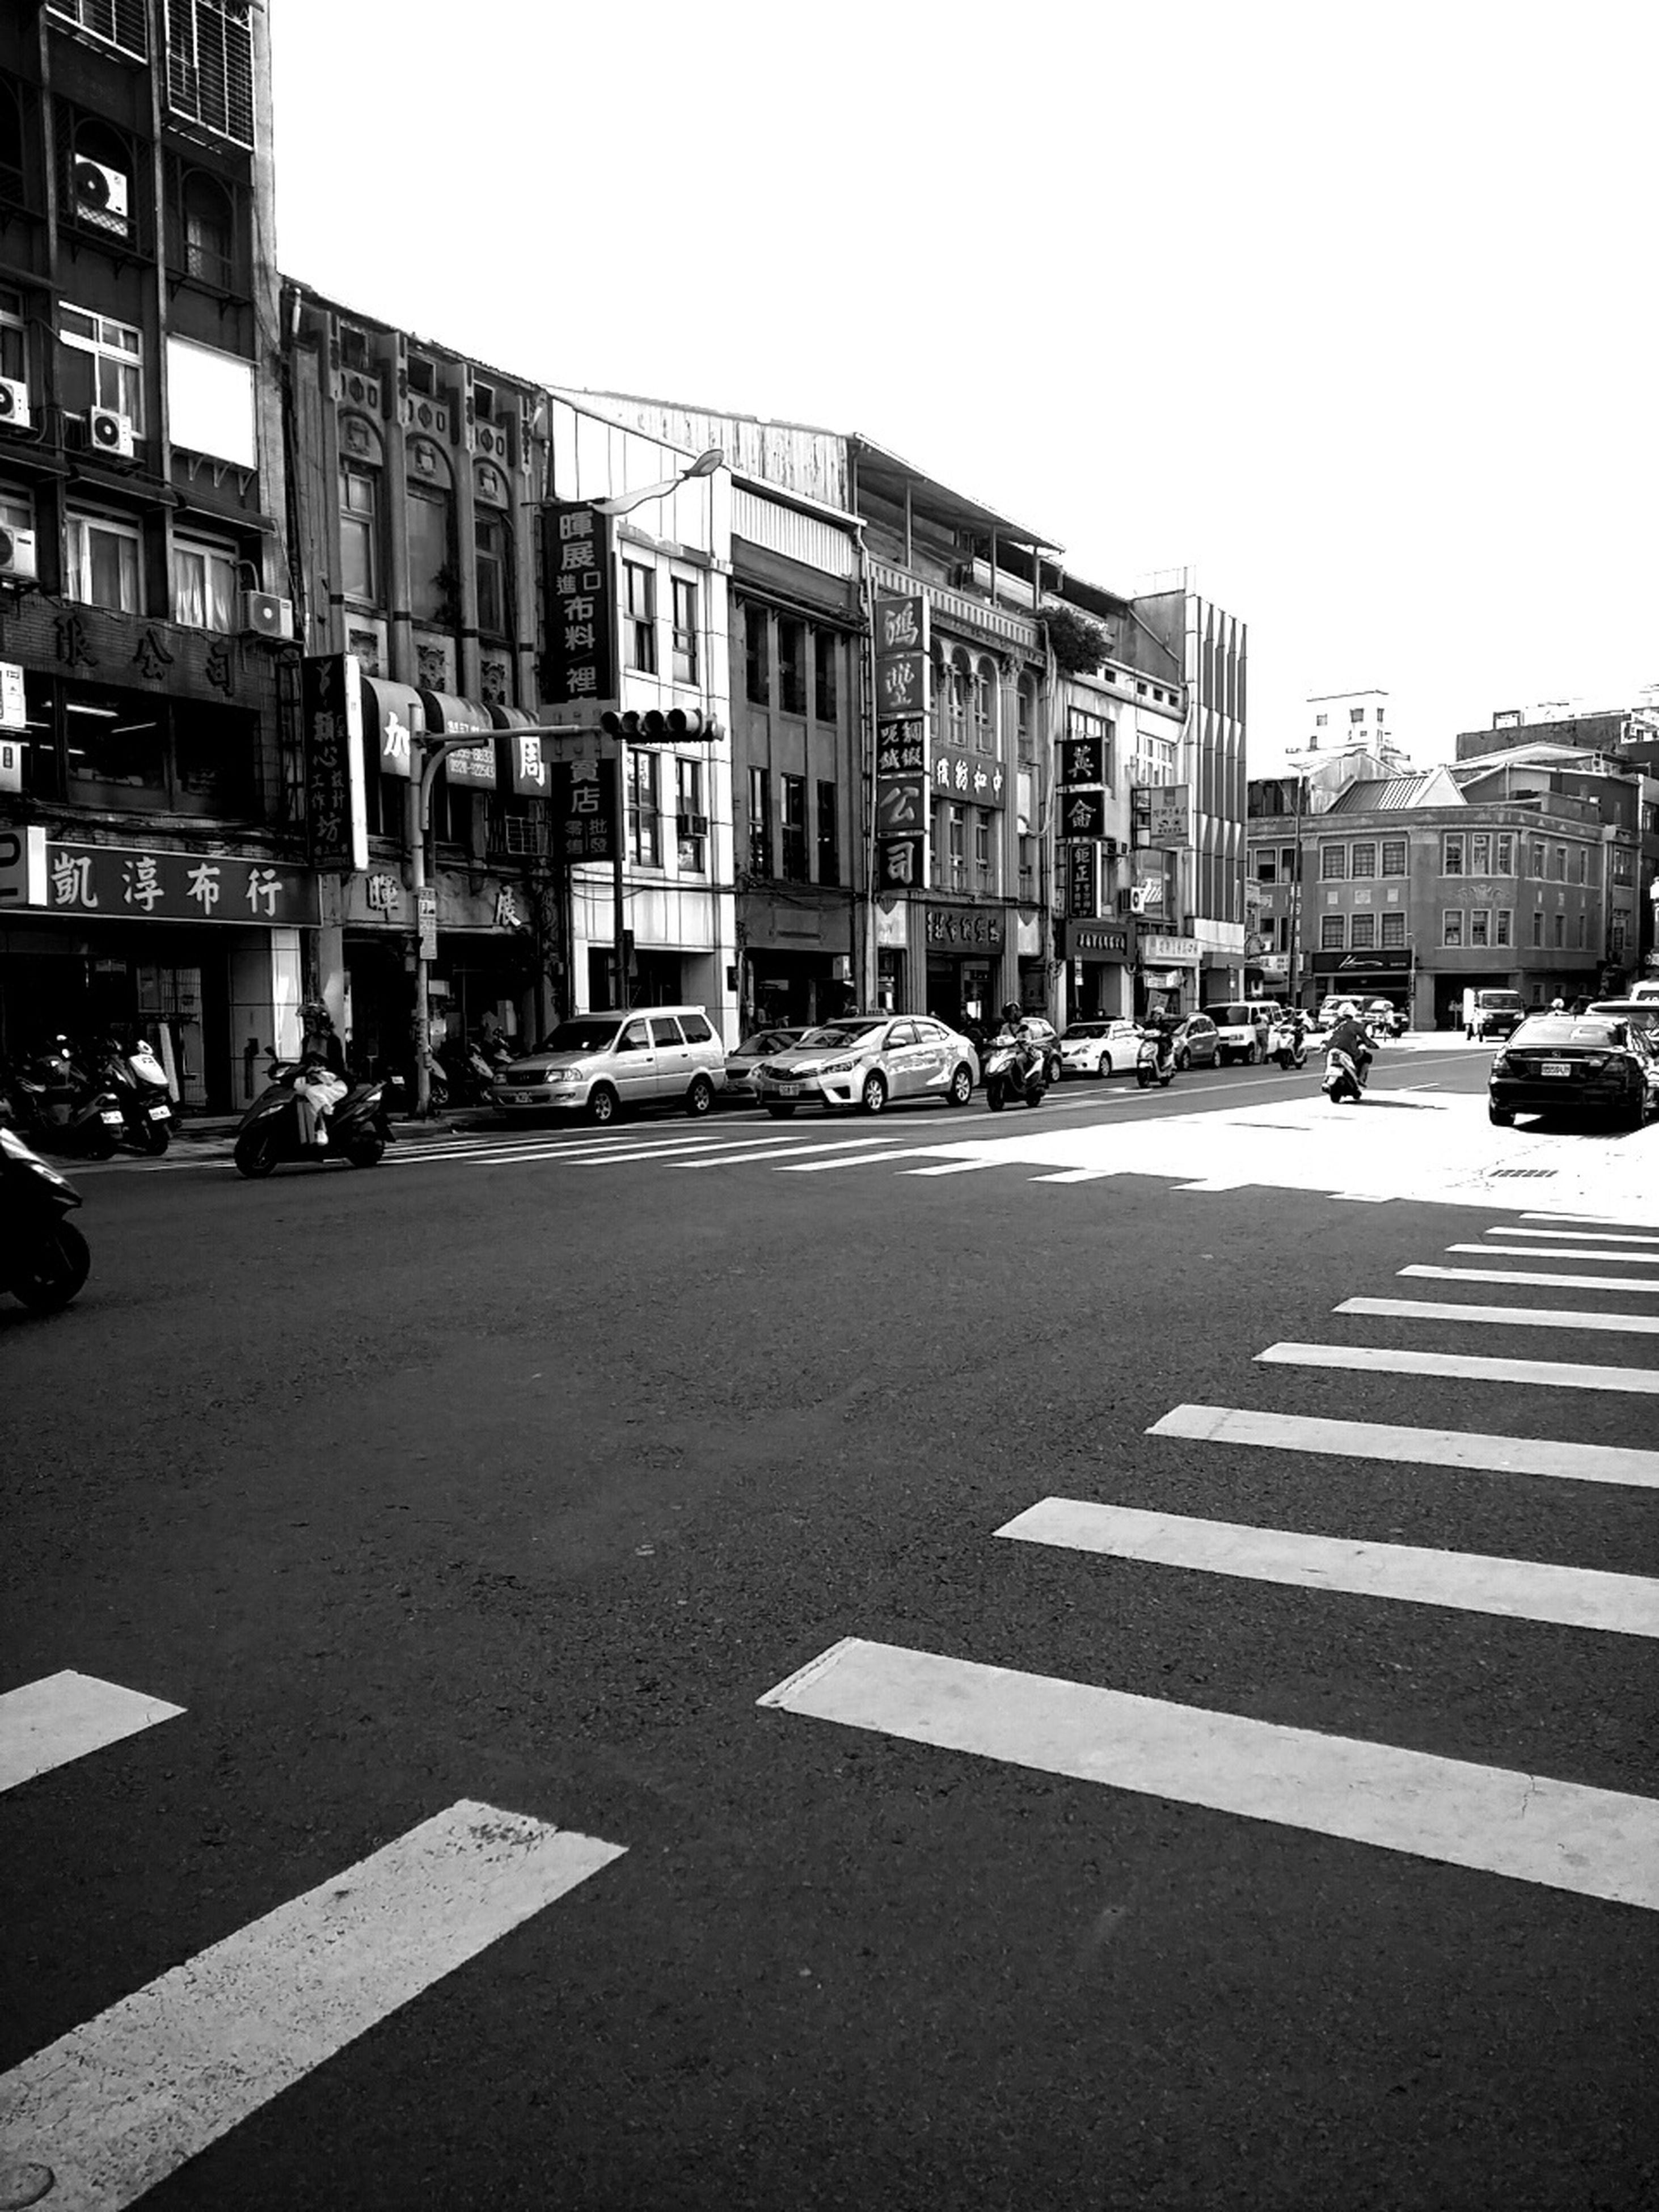 building exterior, road marking, street, architecture, city, built structure, transportation, road, car, city street, zebra crossing, city life, land vehicle, road sign, incidental people, arrow symbol, asphalt, mode of transport, the way forward, guidance